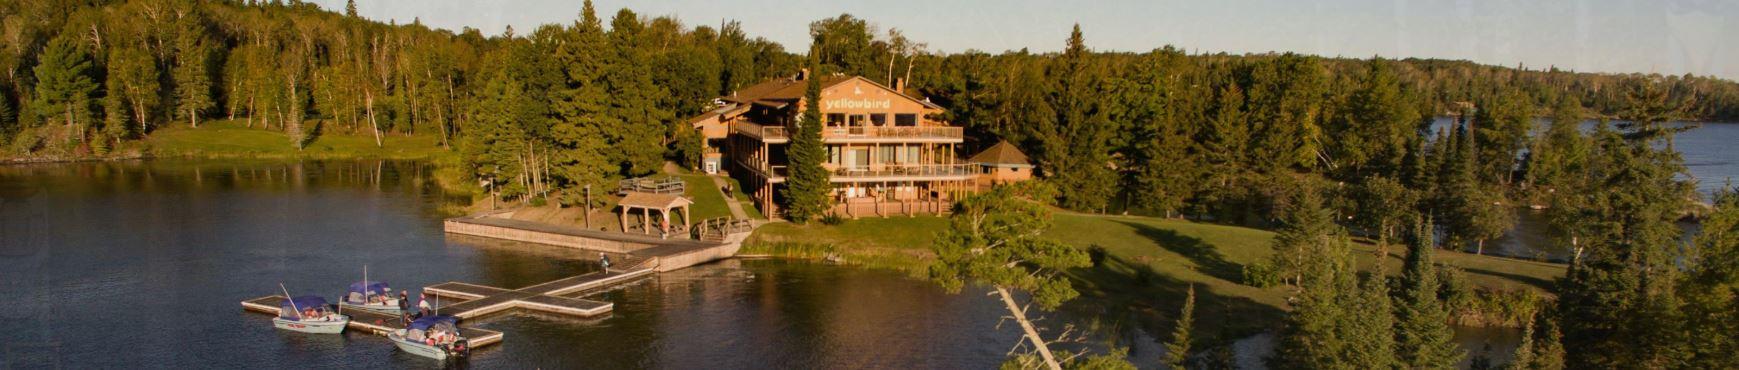 Lake of the Woods Yellowbird Lodge & Chalet